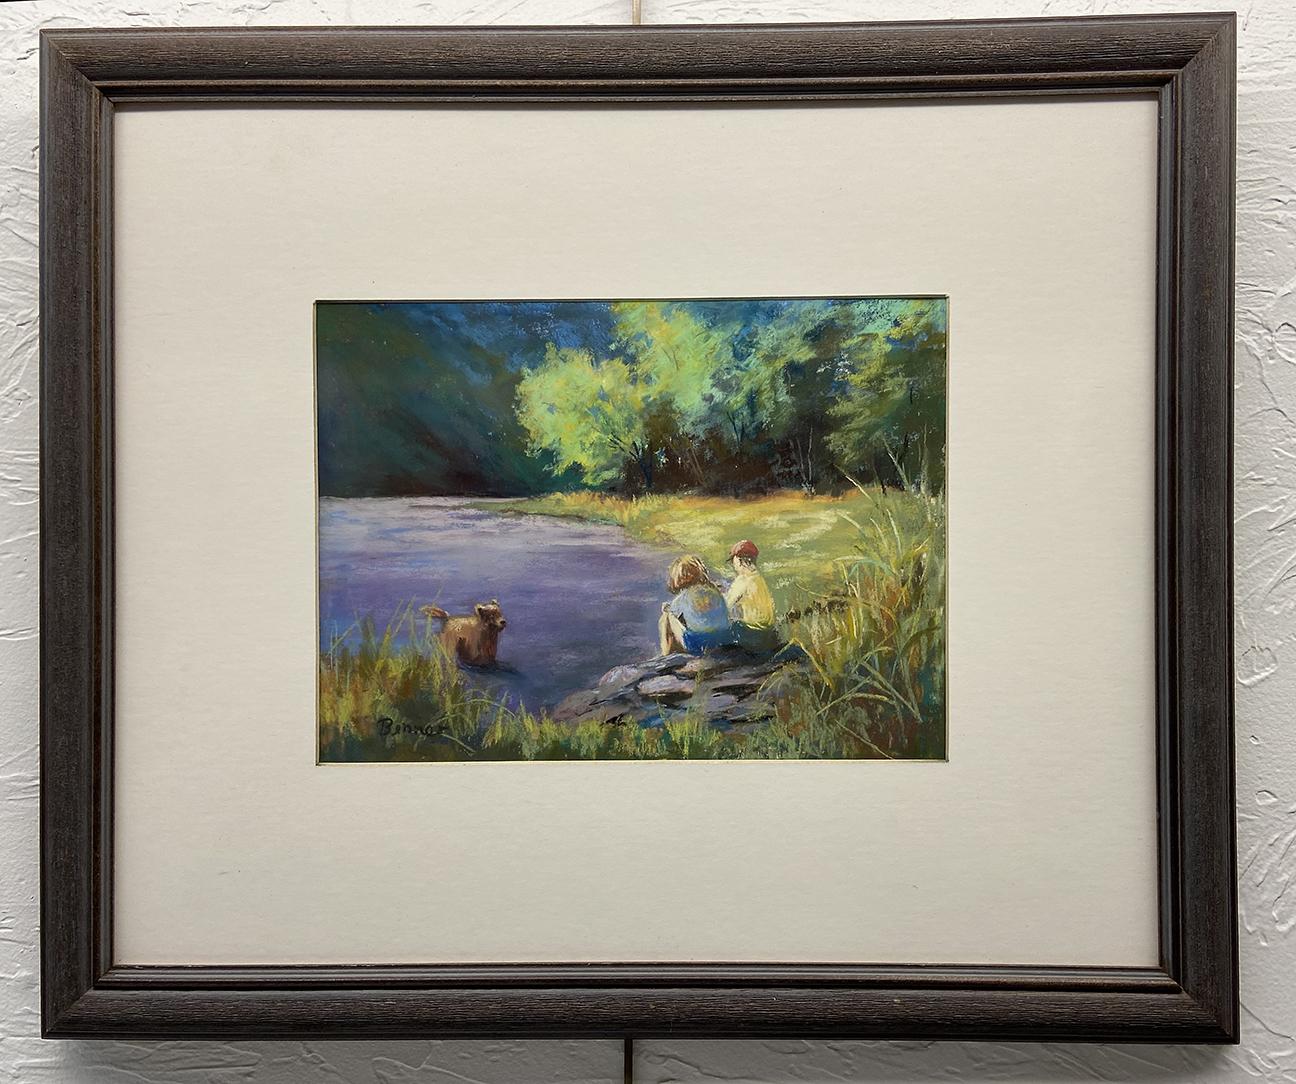 #7 Dog in a  Pond, Sharon Benner, Pastel (22 x 18), $45.00 suggested minimum bid  (140 meals)